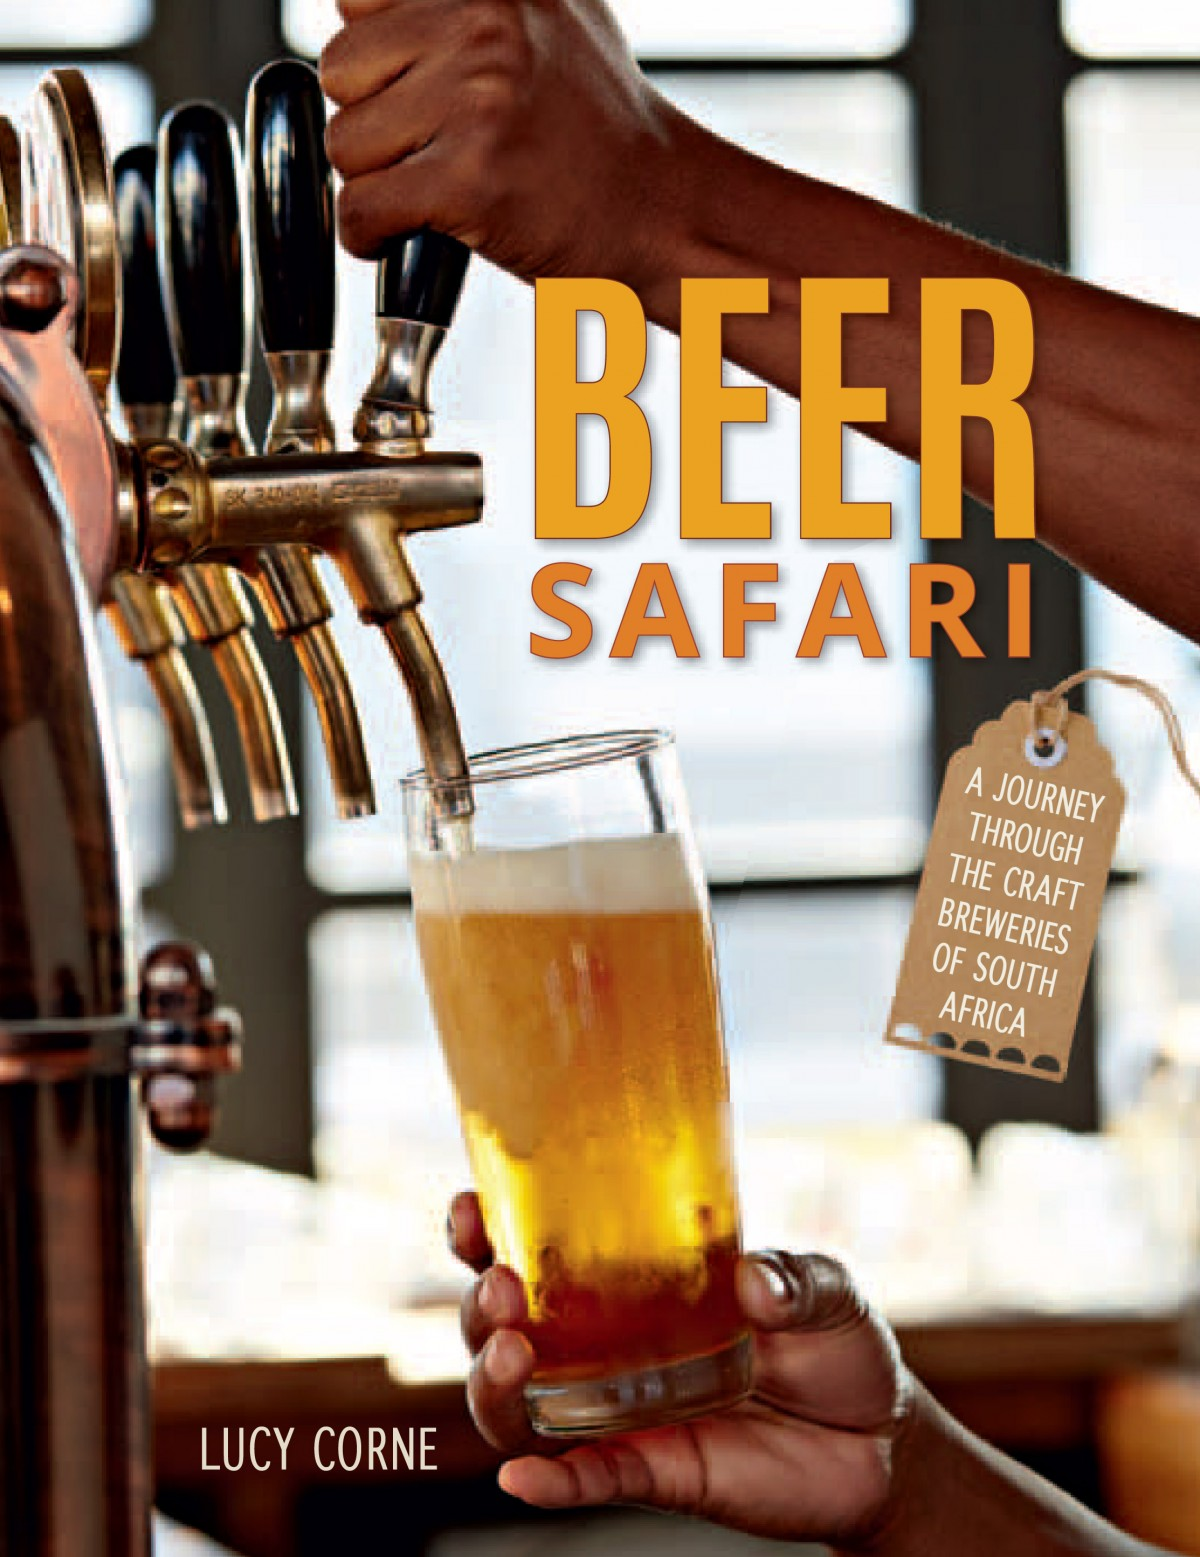 beer safari lucy corne